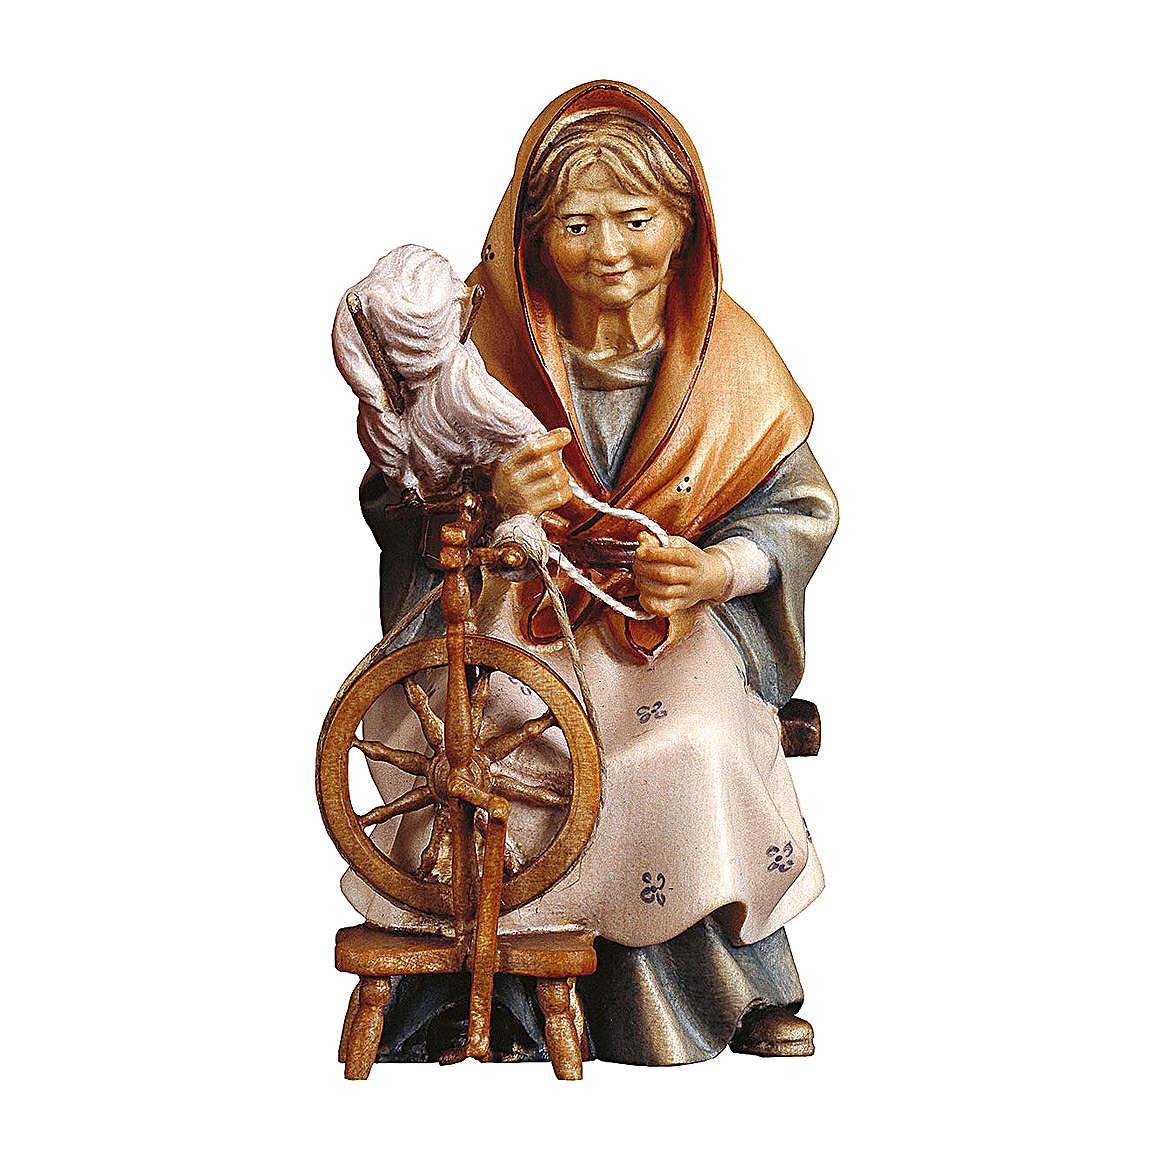 Anziana contadina con filatoio presepe Original Pastore legno dipinto in Valgardena 10 cm 4